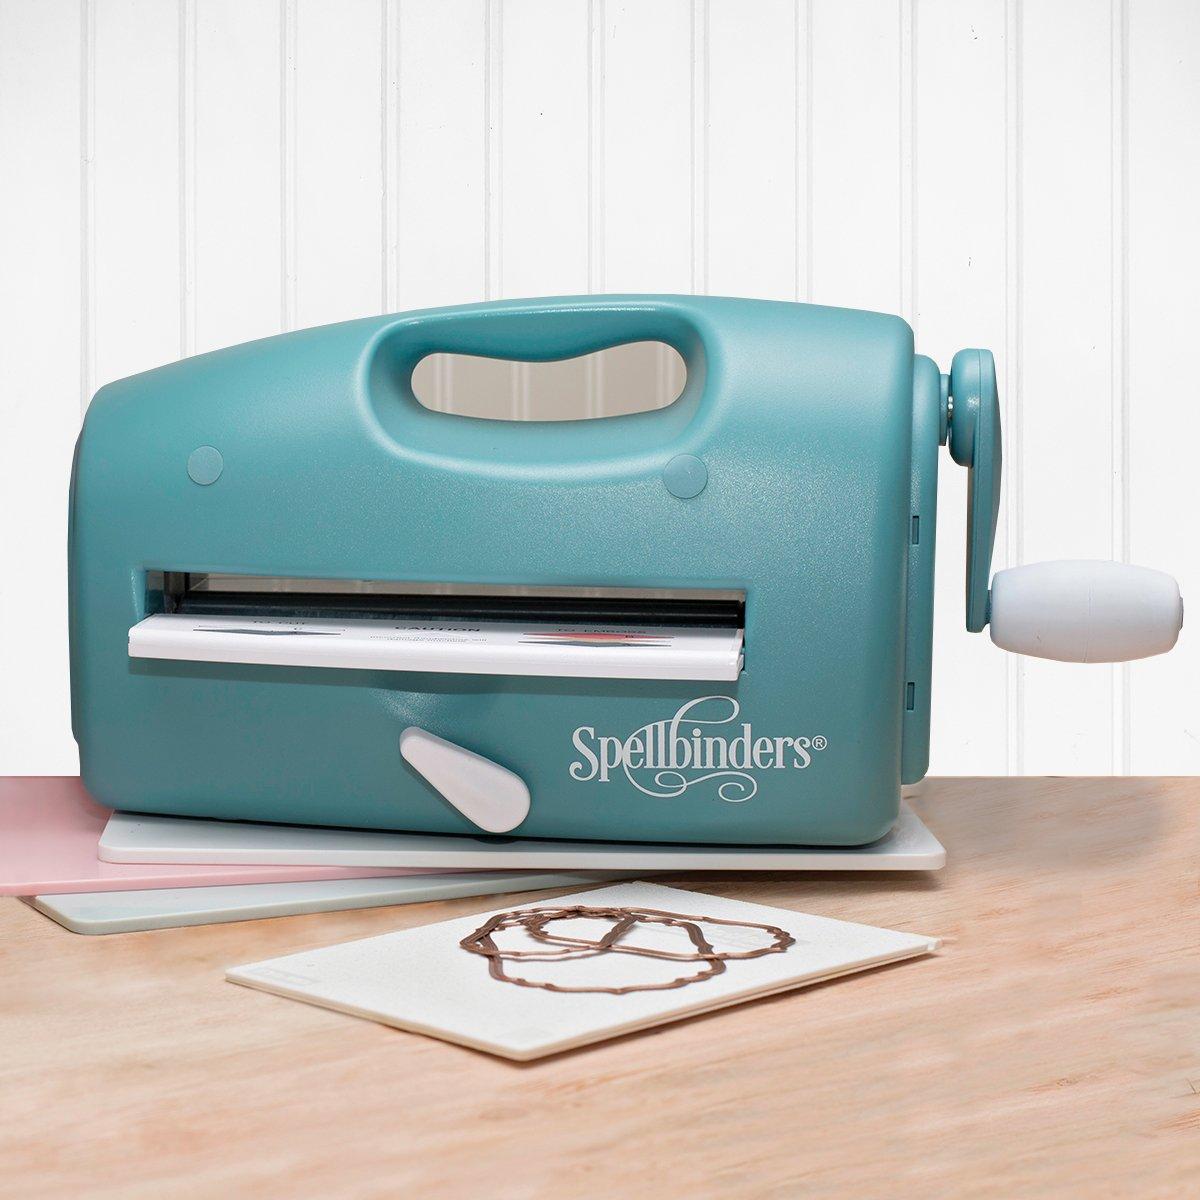 Spellbinders Grand Calibur Die Cutting Machine